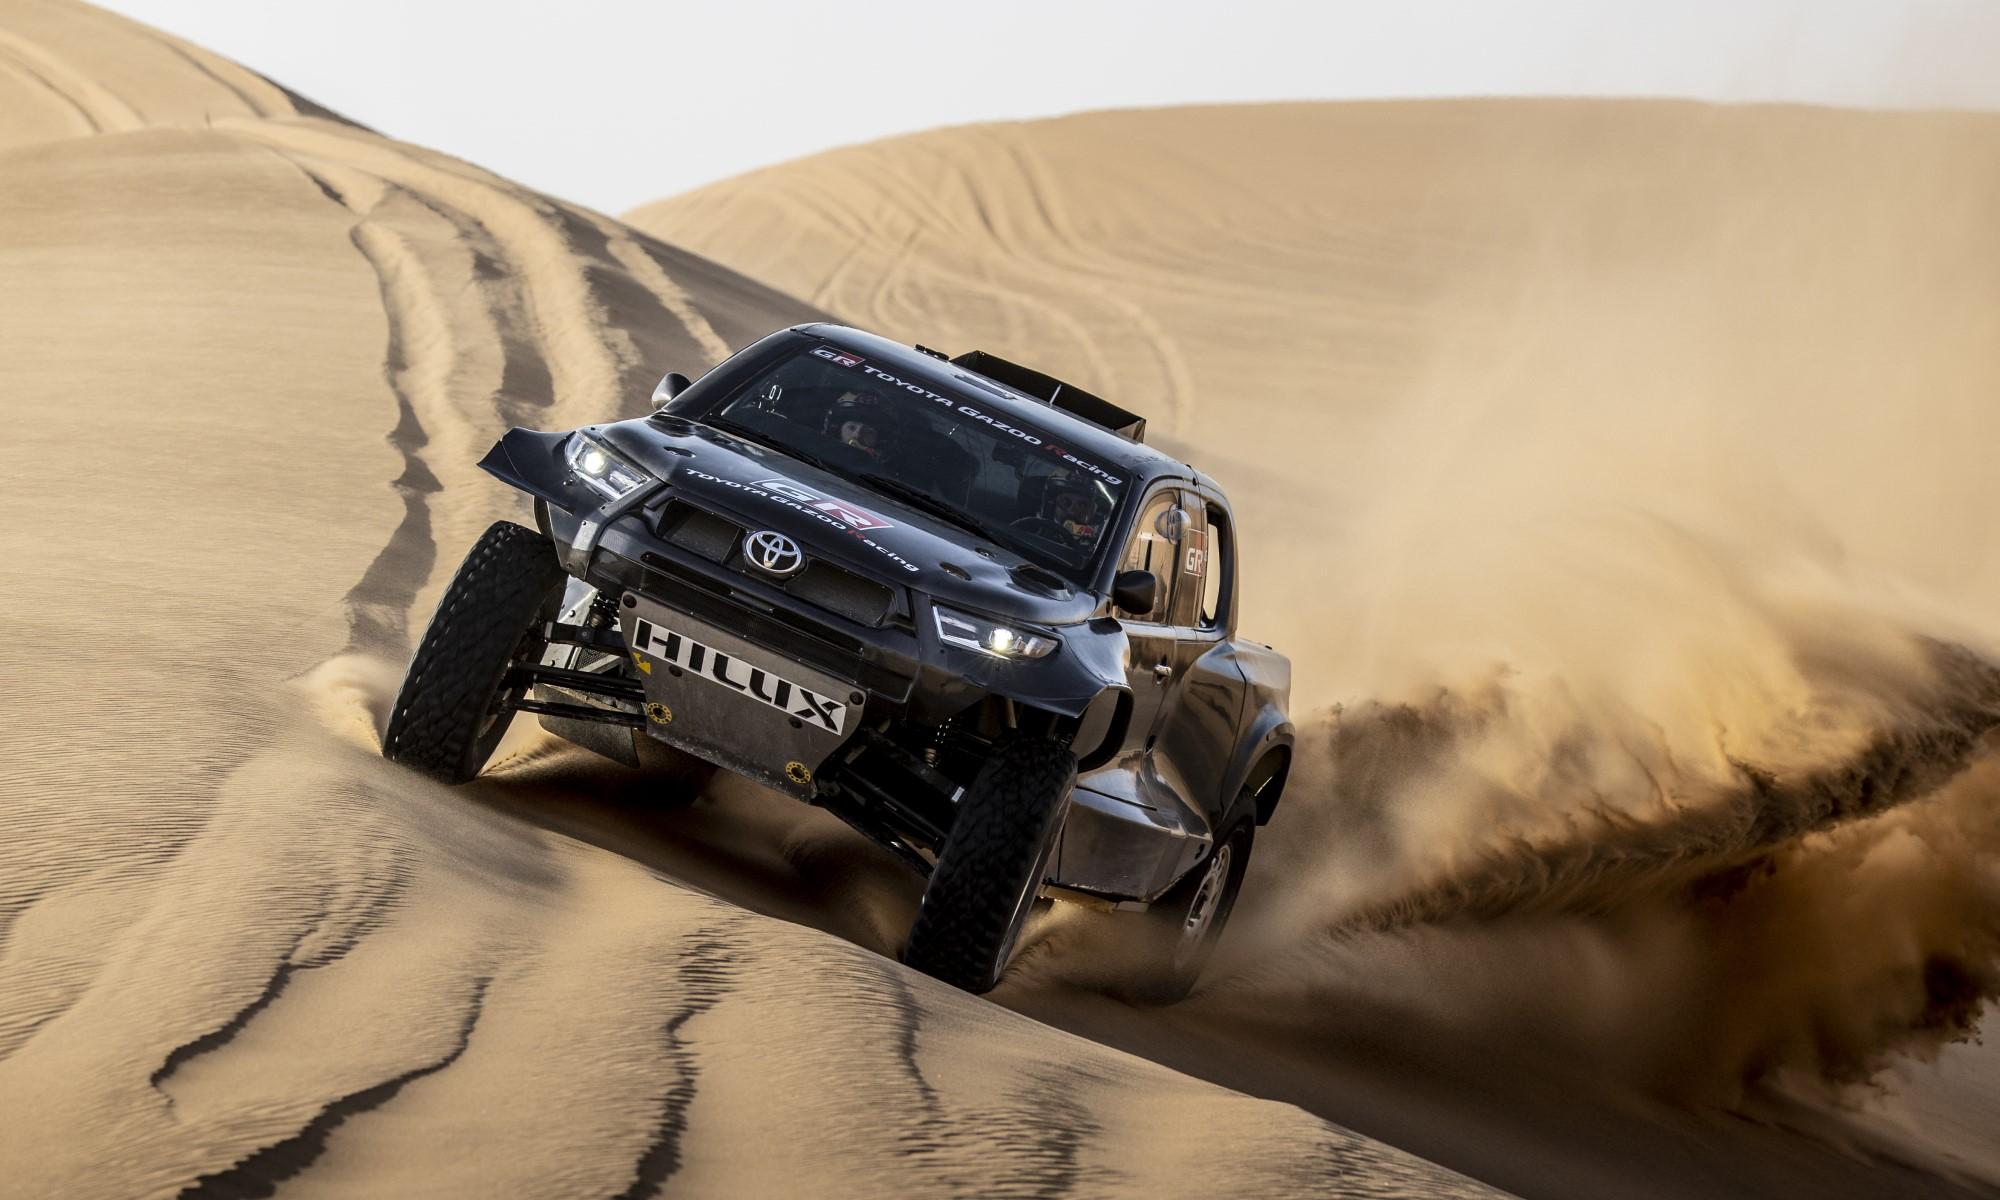 Toyota GR DKR Hilux T1+ Racer Unveiled